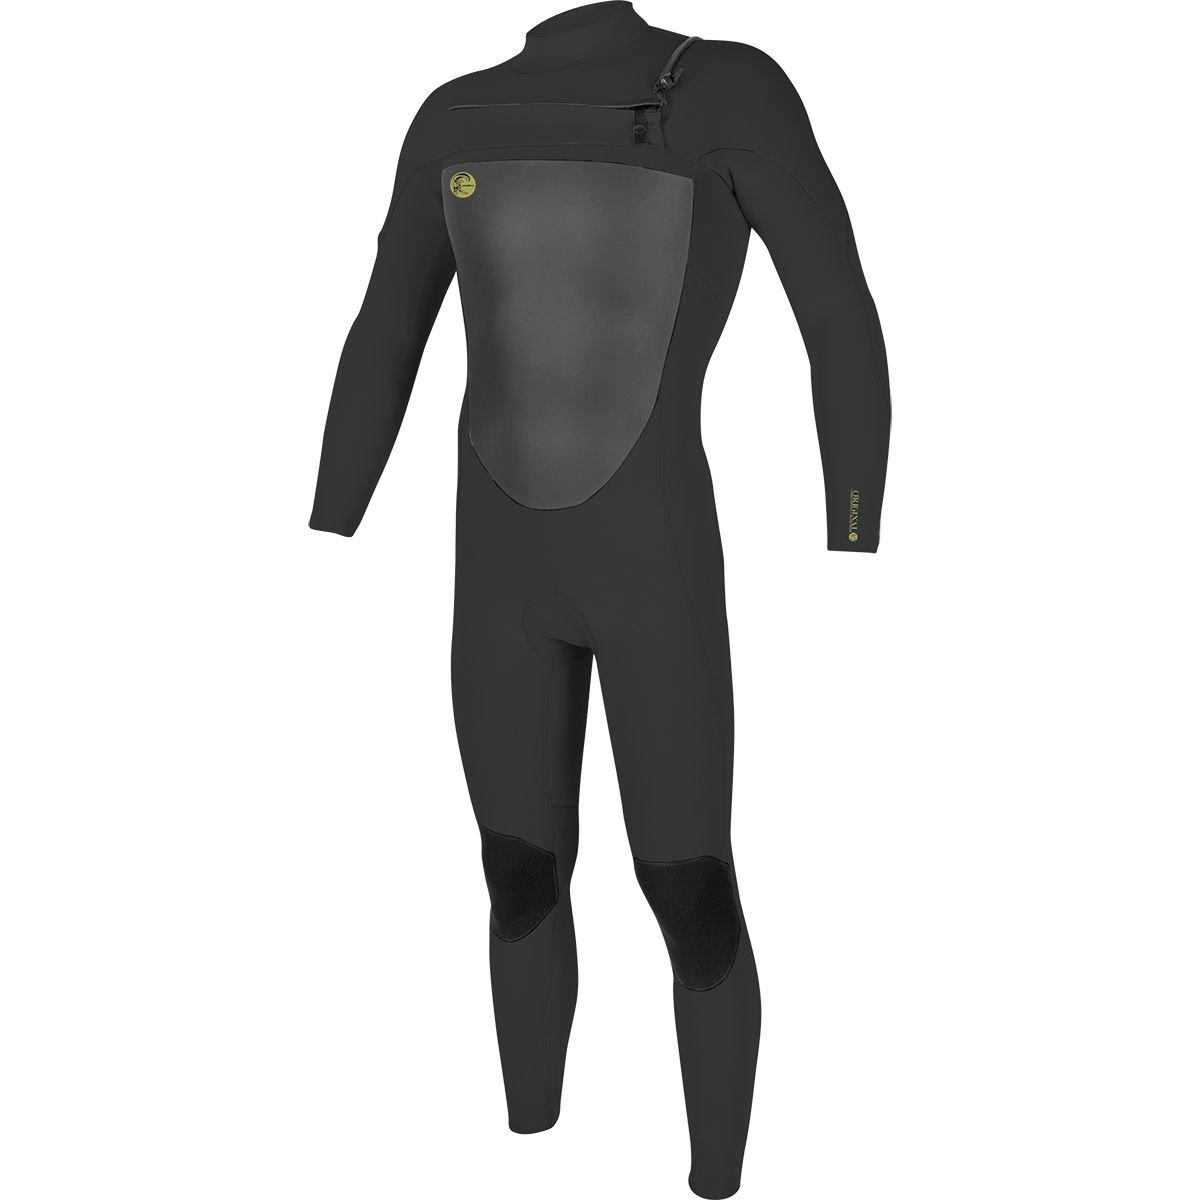 O'Neill Men's O'Riginal 3/2 mm Chest Zip Full Wetsuit, Oil/Oil, X-Small